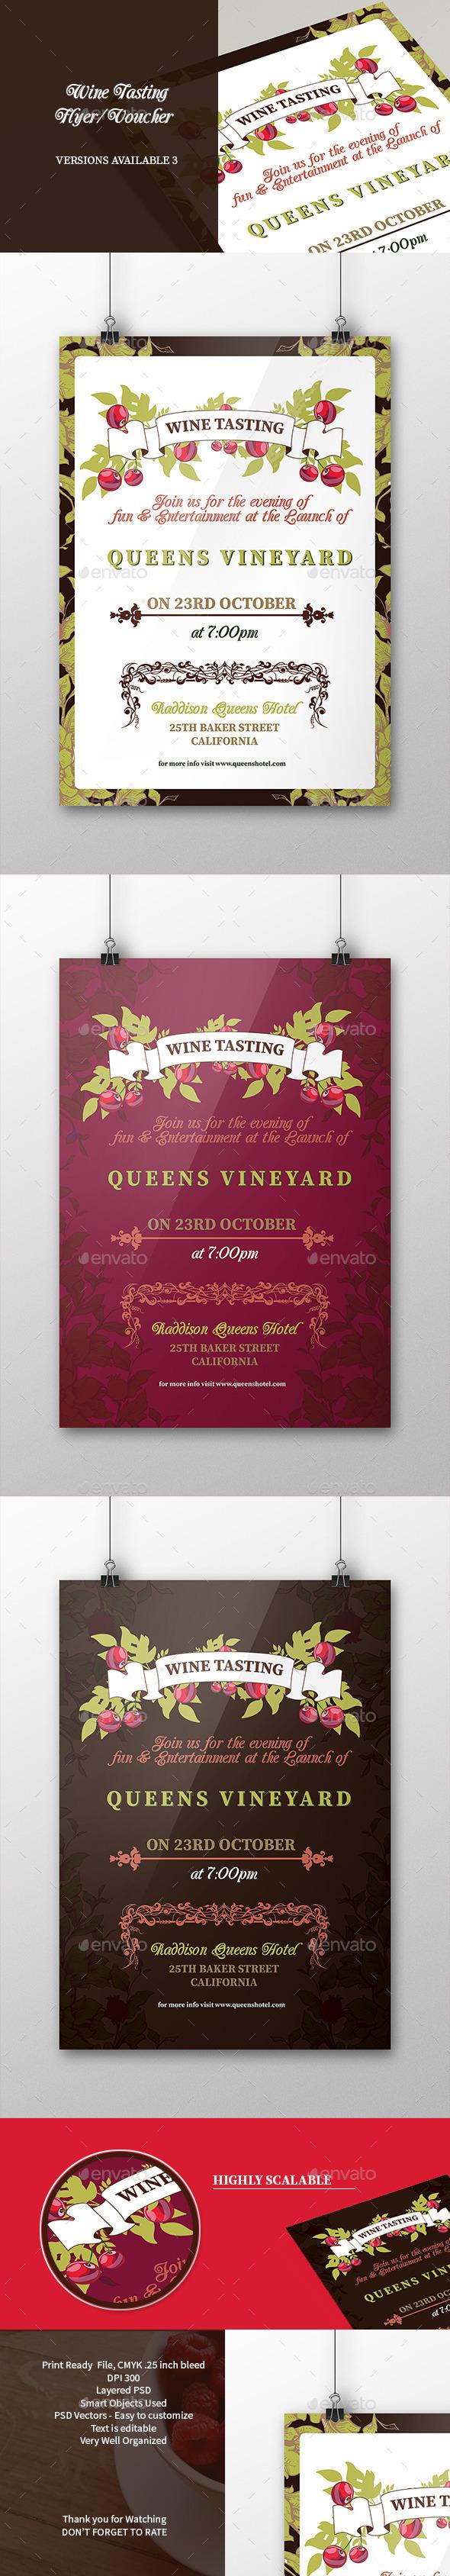 Wine Tasting Flyer Poster